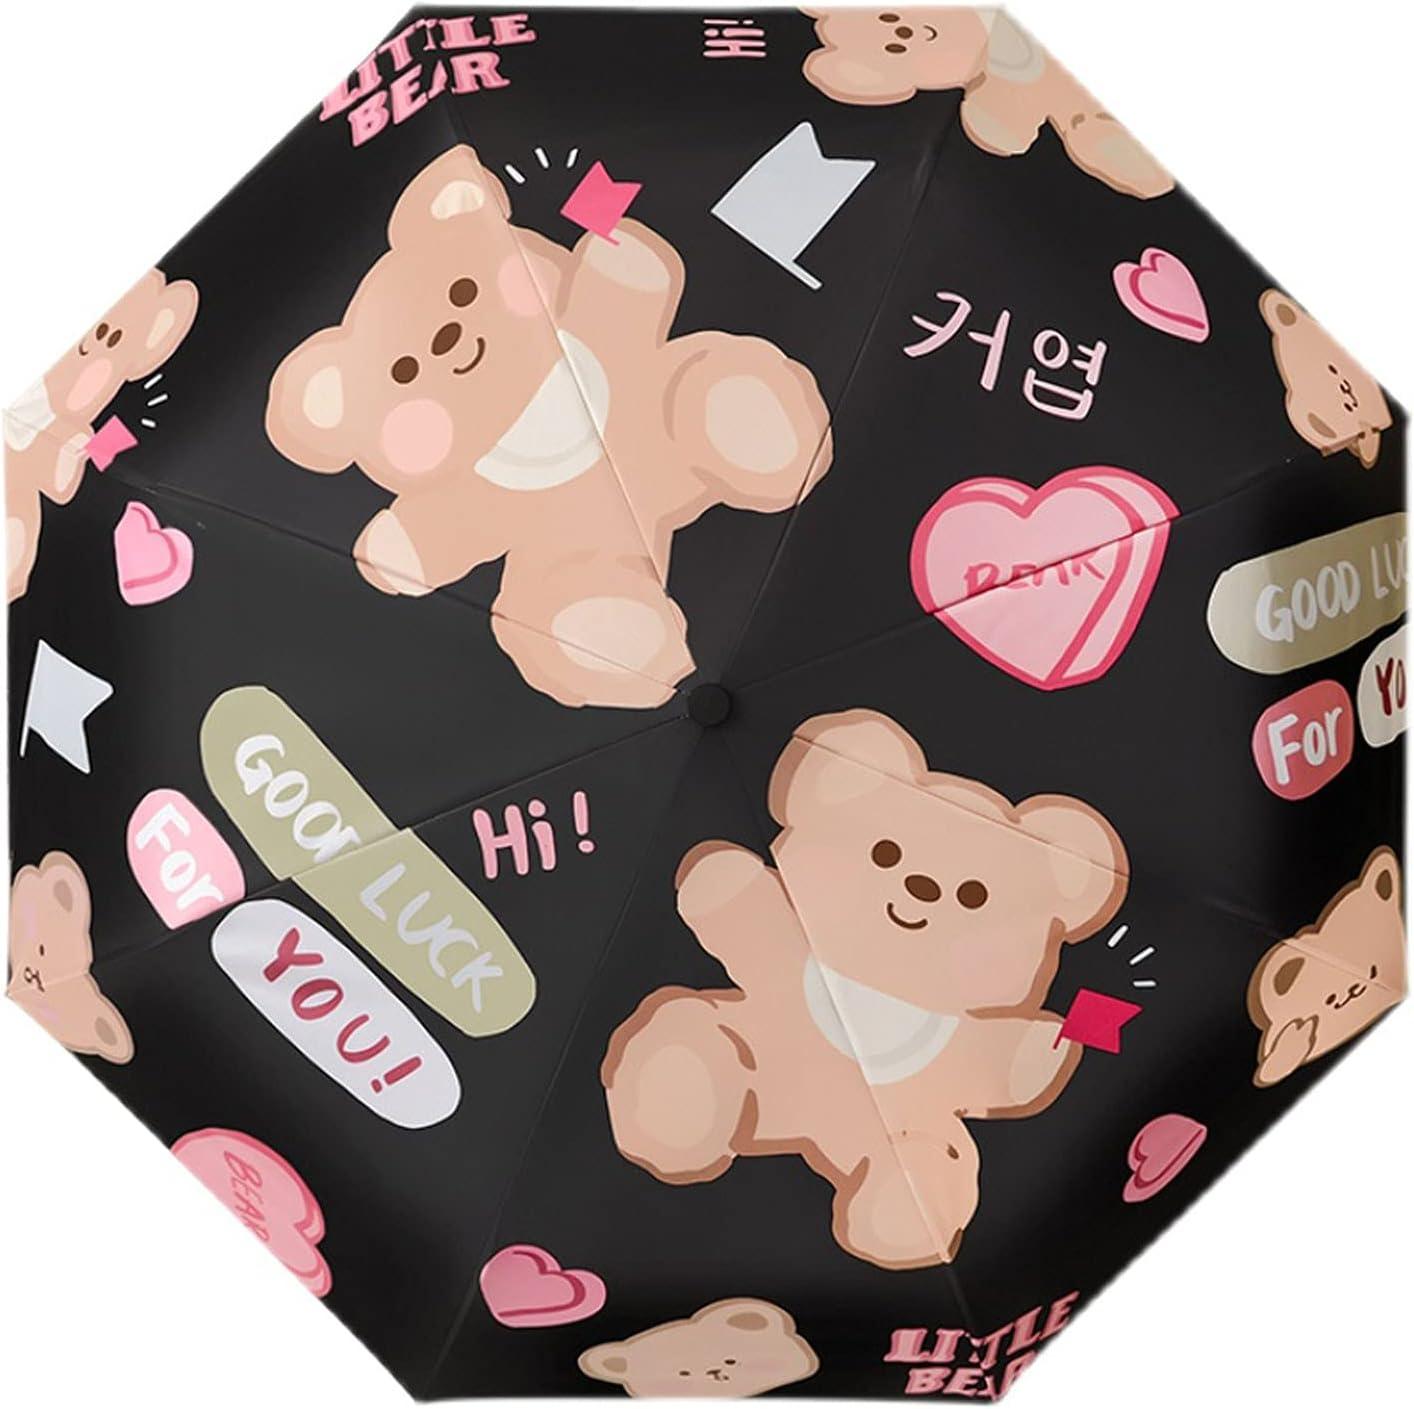 Luxury VWJFHIS Umbrella Women's Year-end gift Rain and Dual-Purpose Light Folding Sun